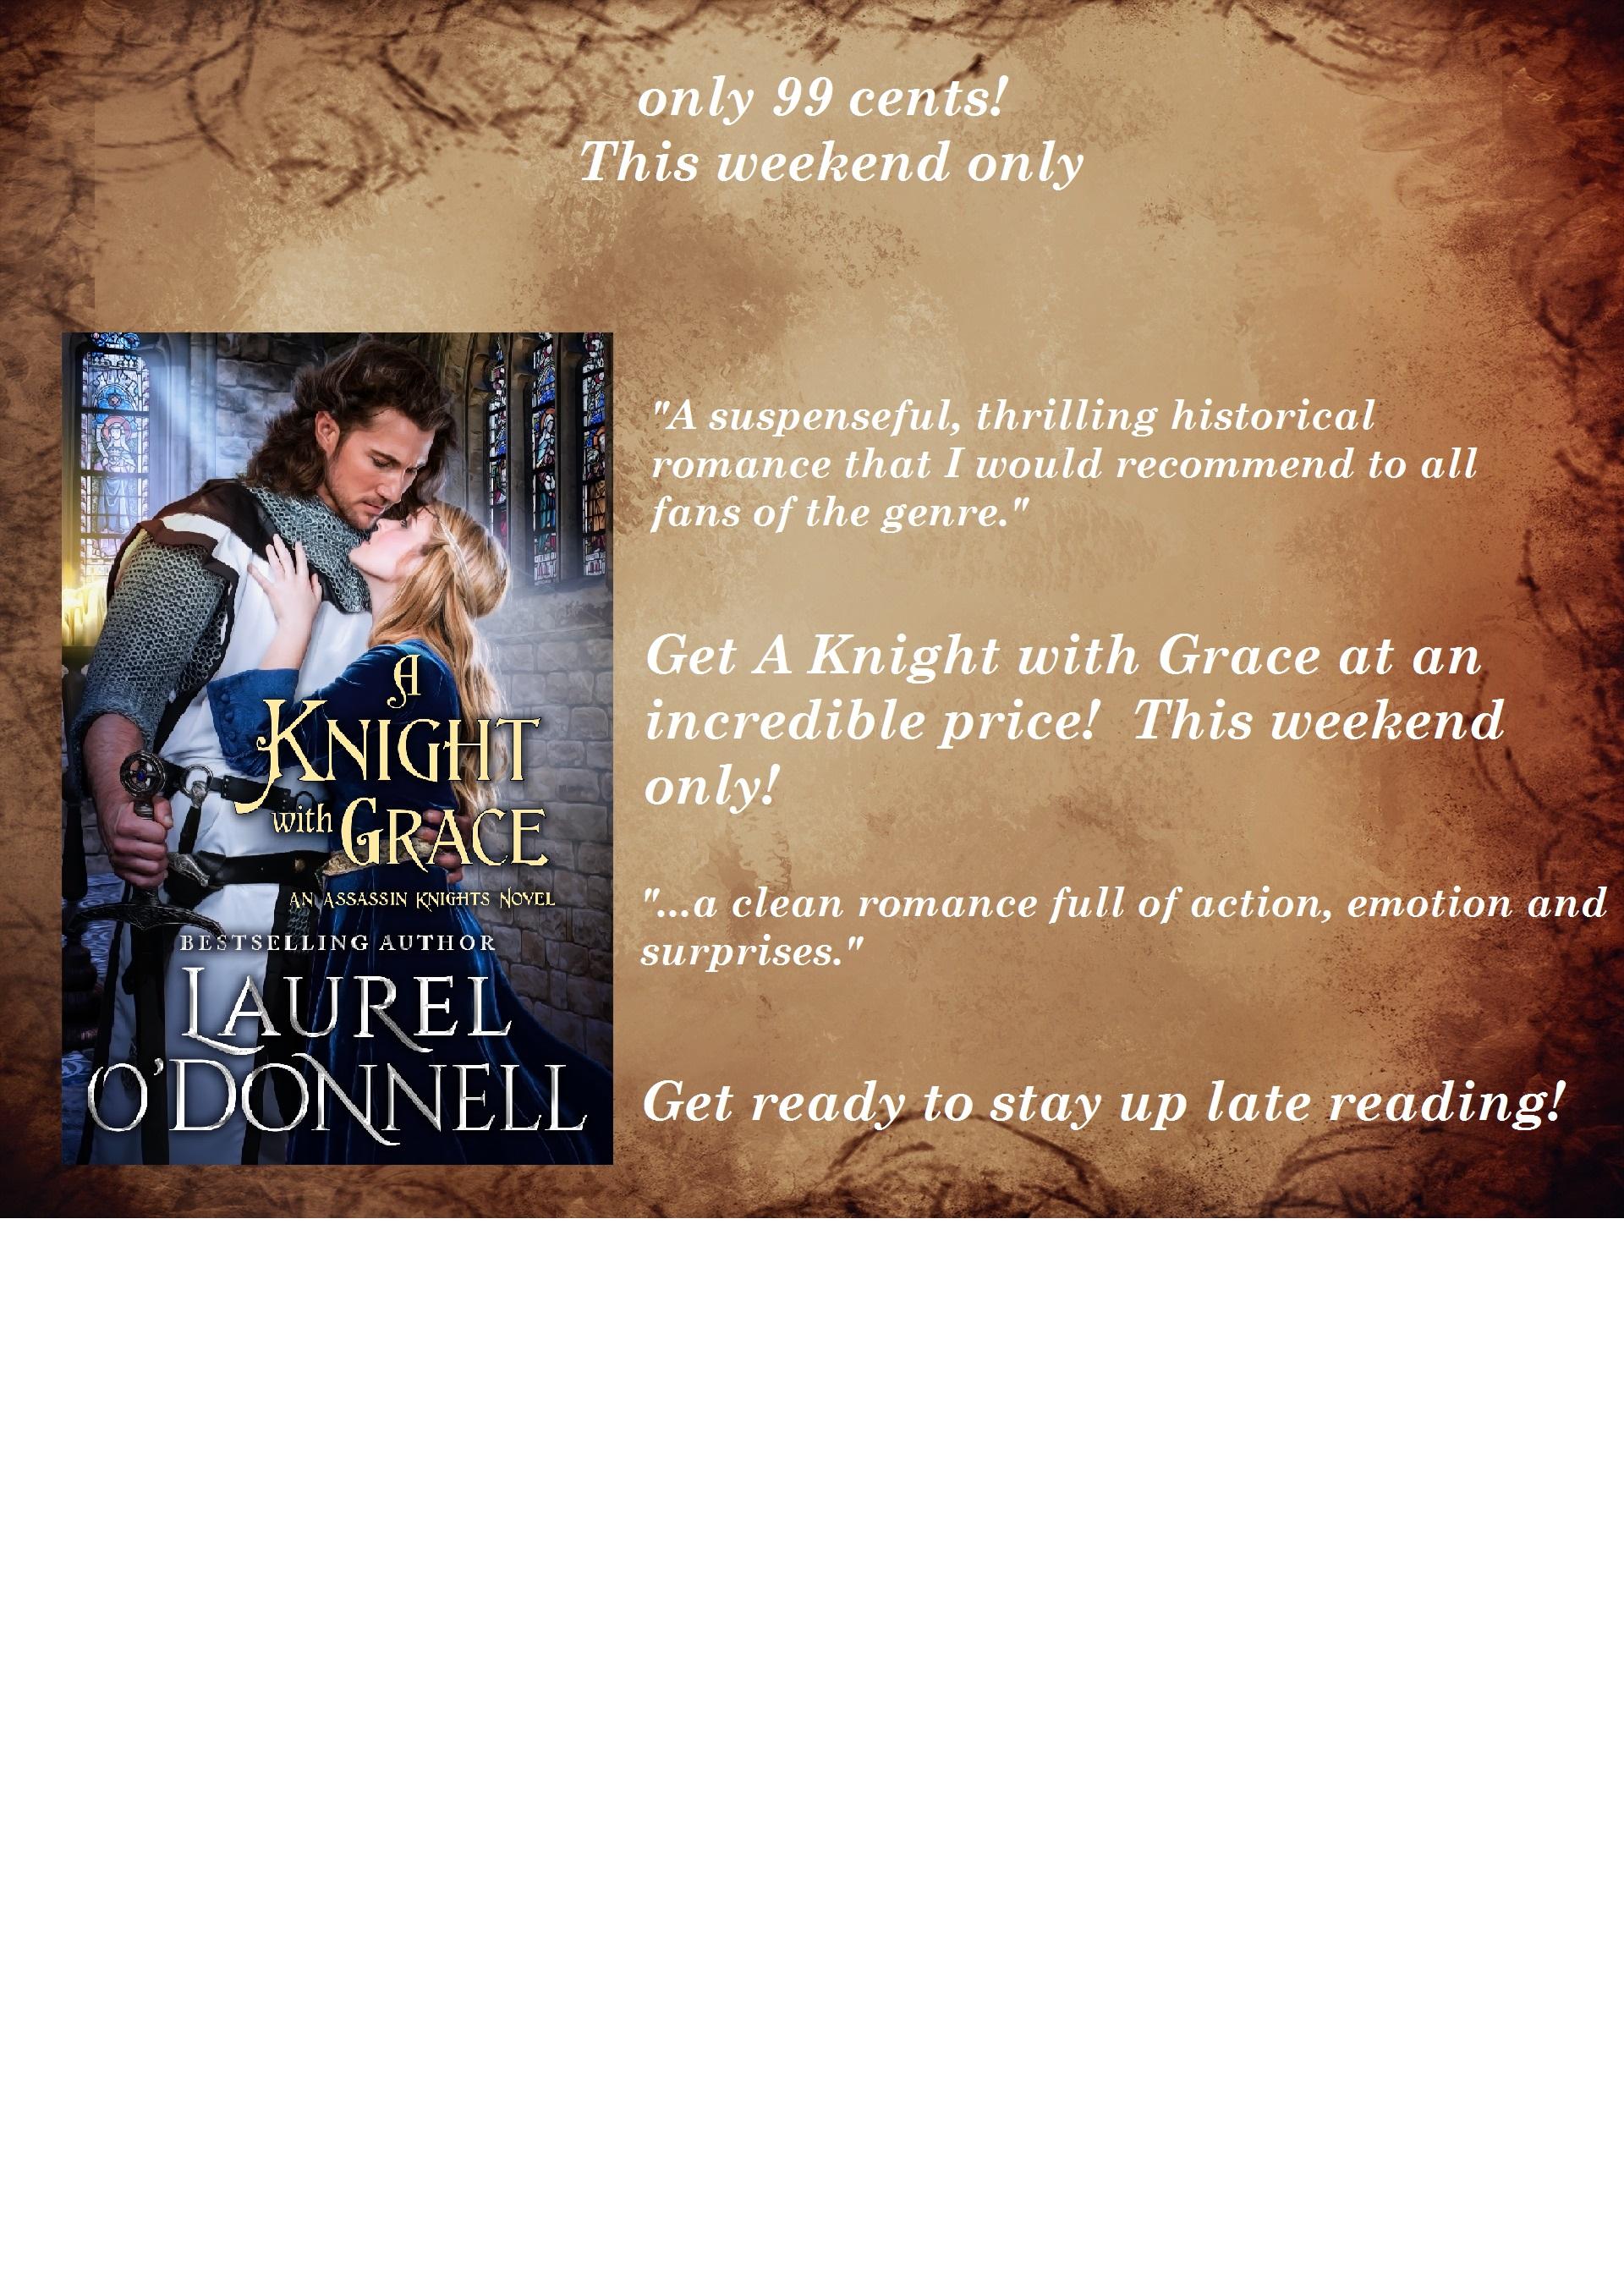 knight-of-grace-sale